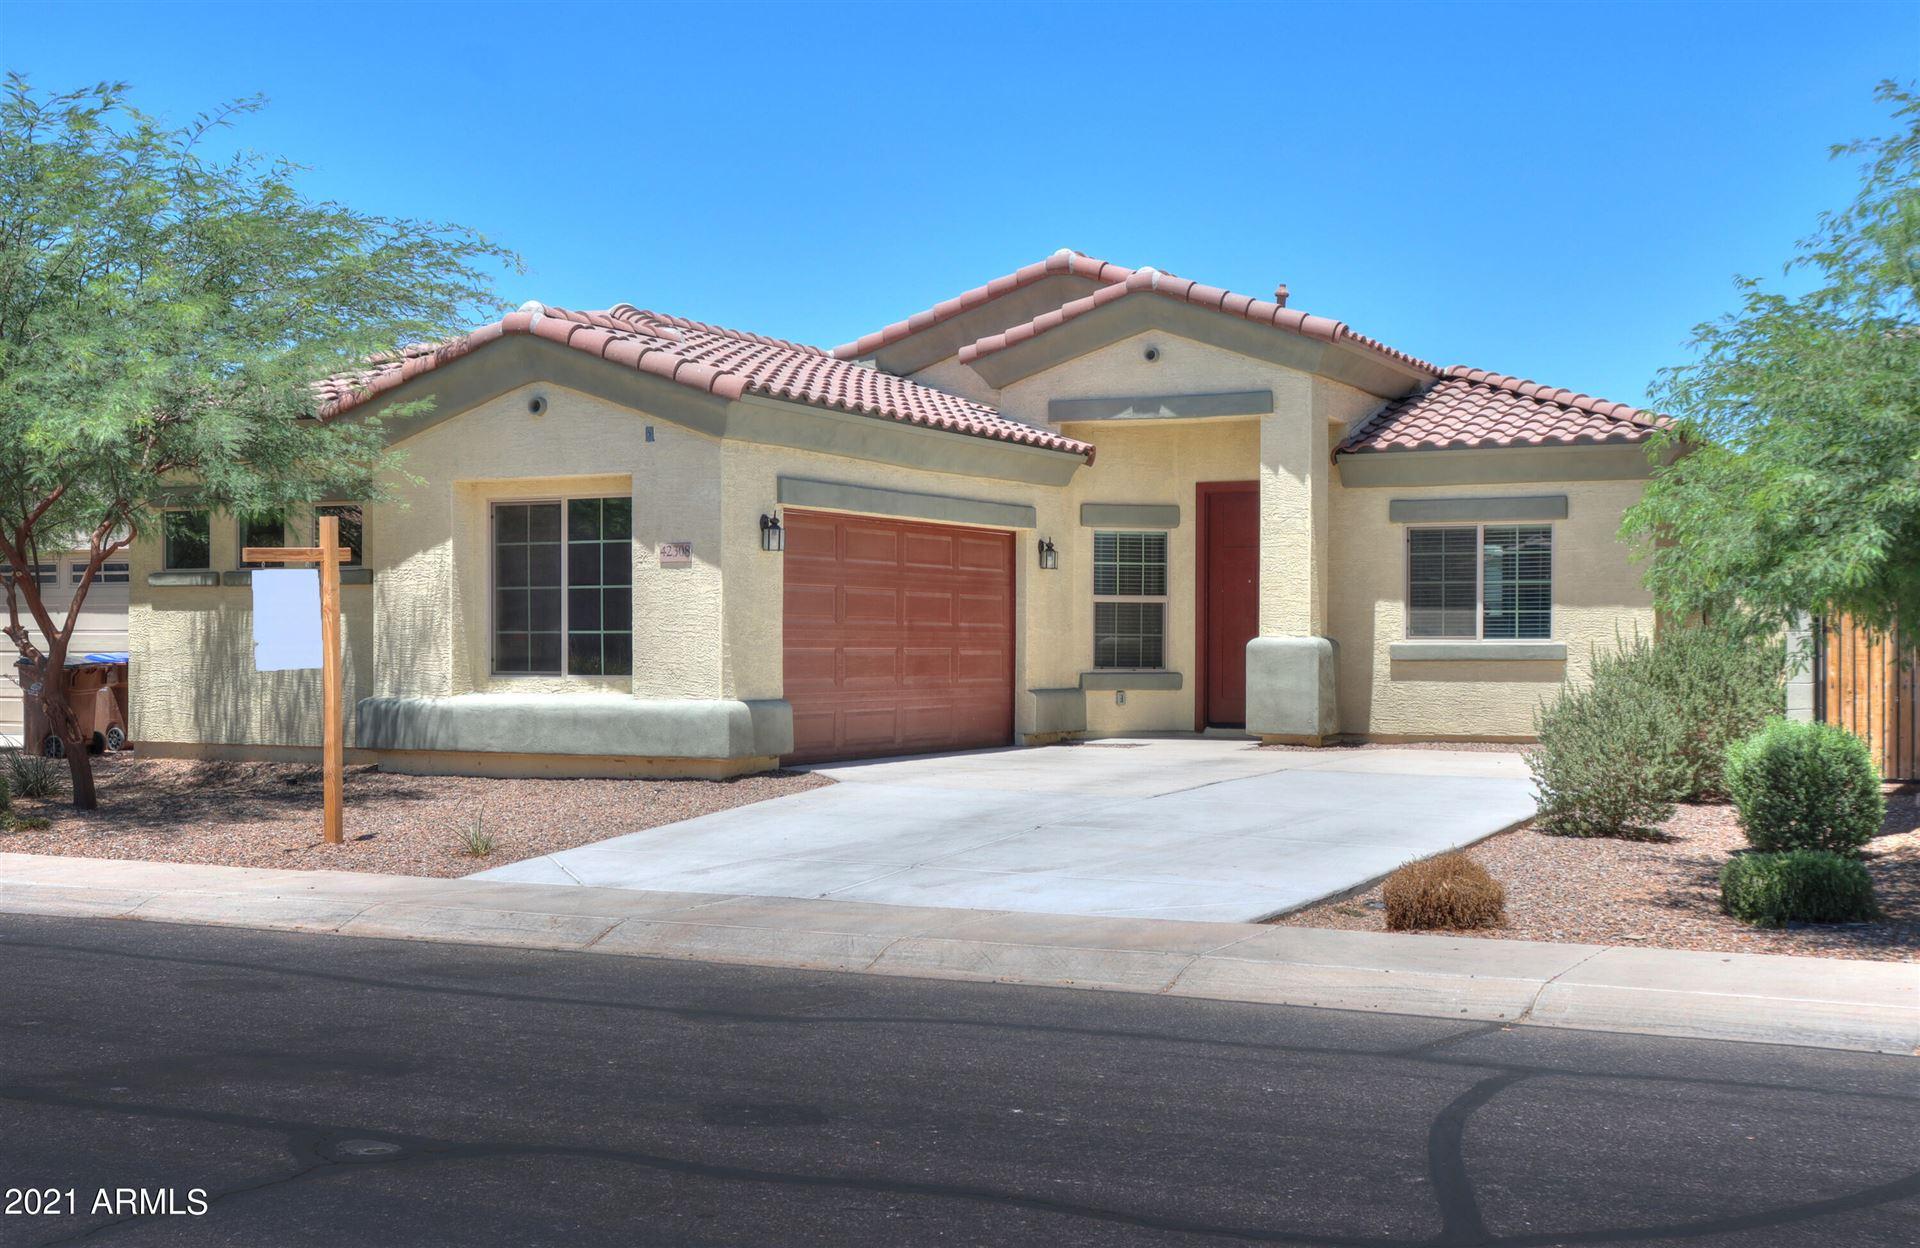 Photo of 42308 W BALSA Drive, Maricopa, AZ 85138 (MLS # 6250133)